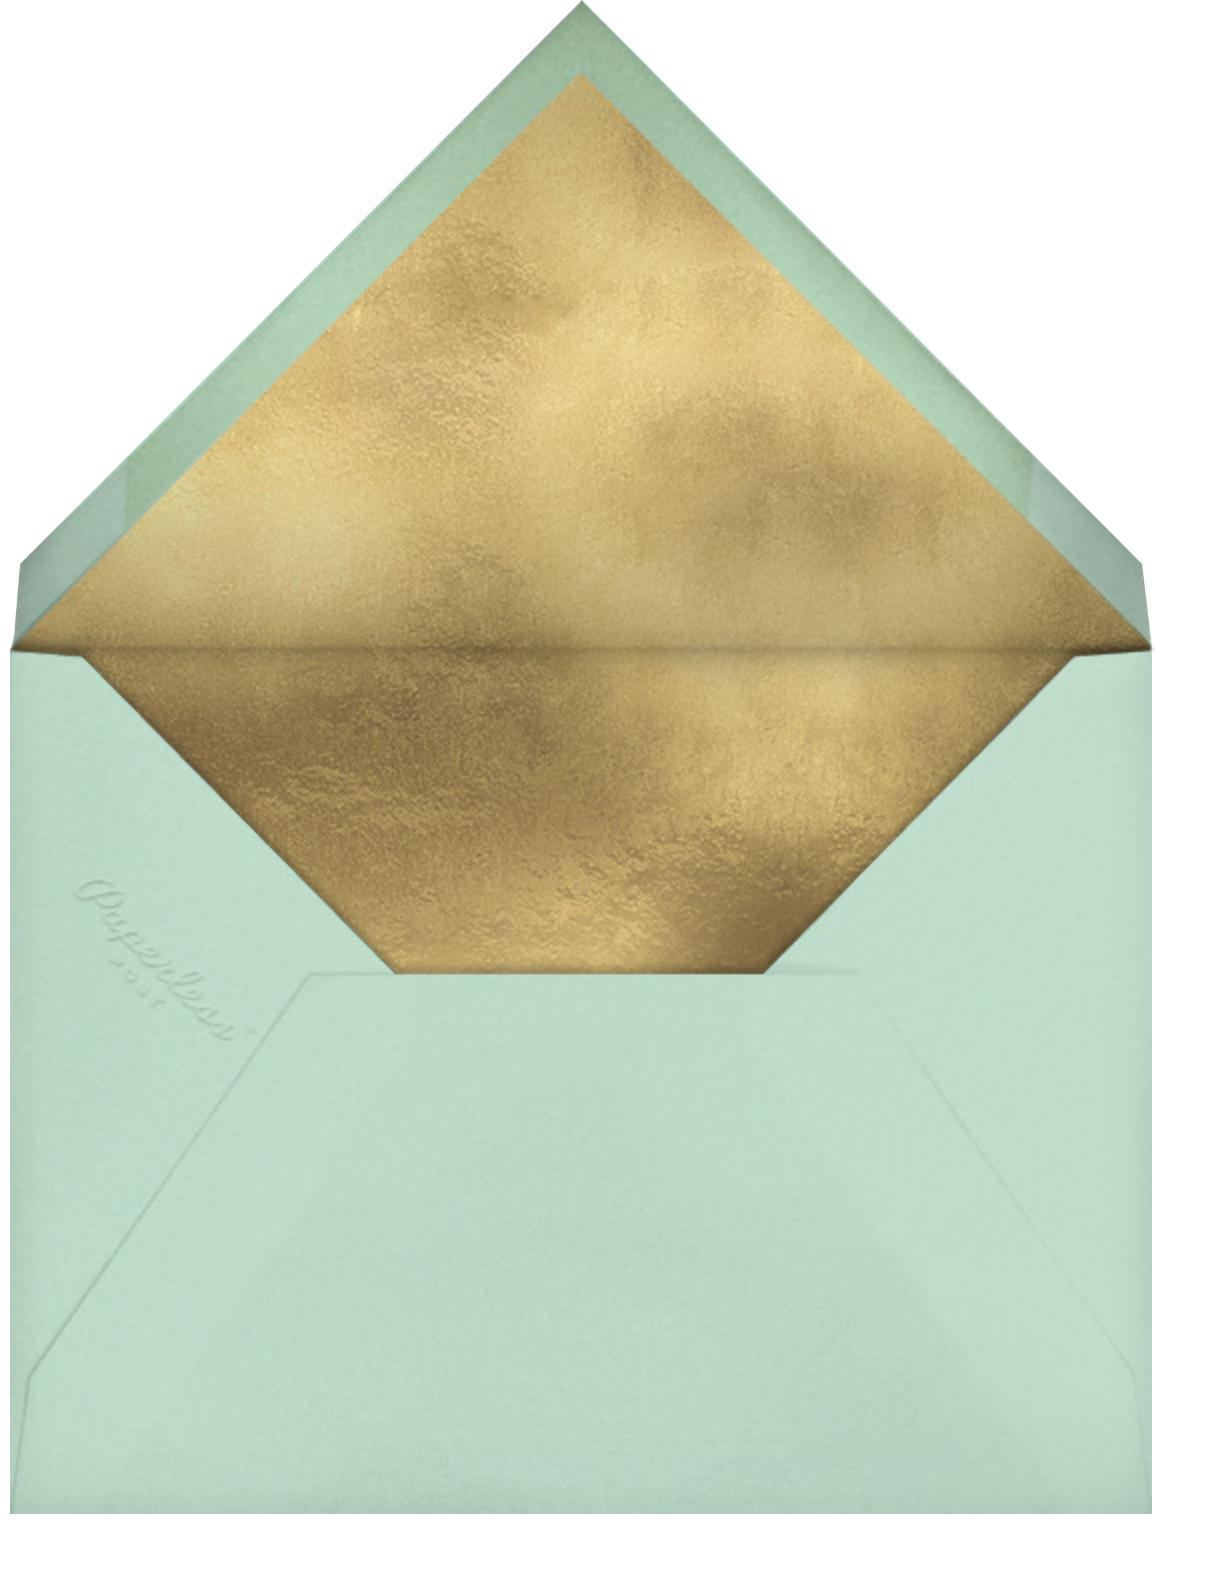 Baby Bunting - Blues - Meri Meri - Envelope